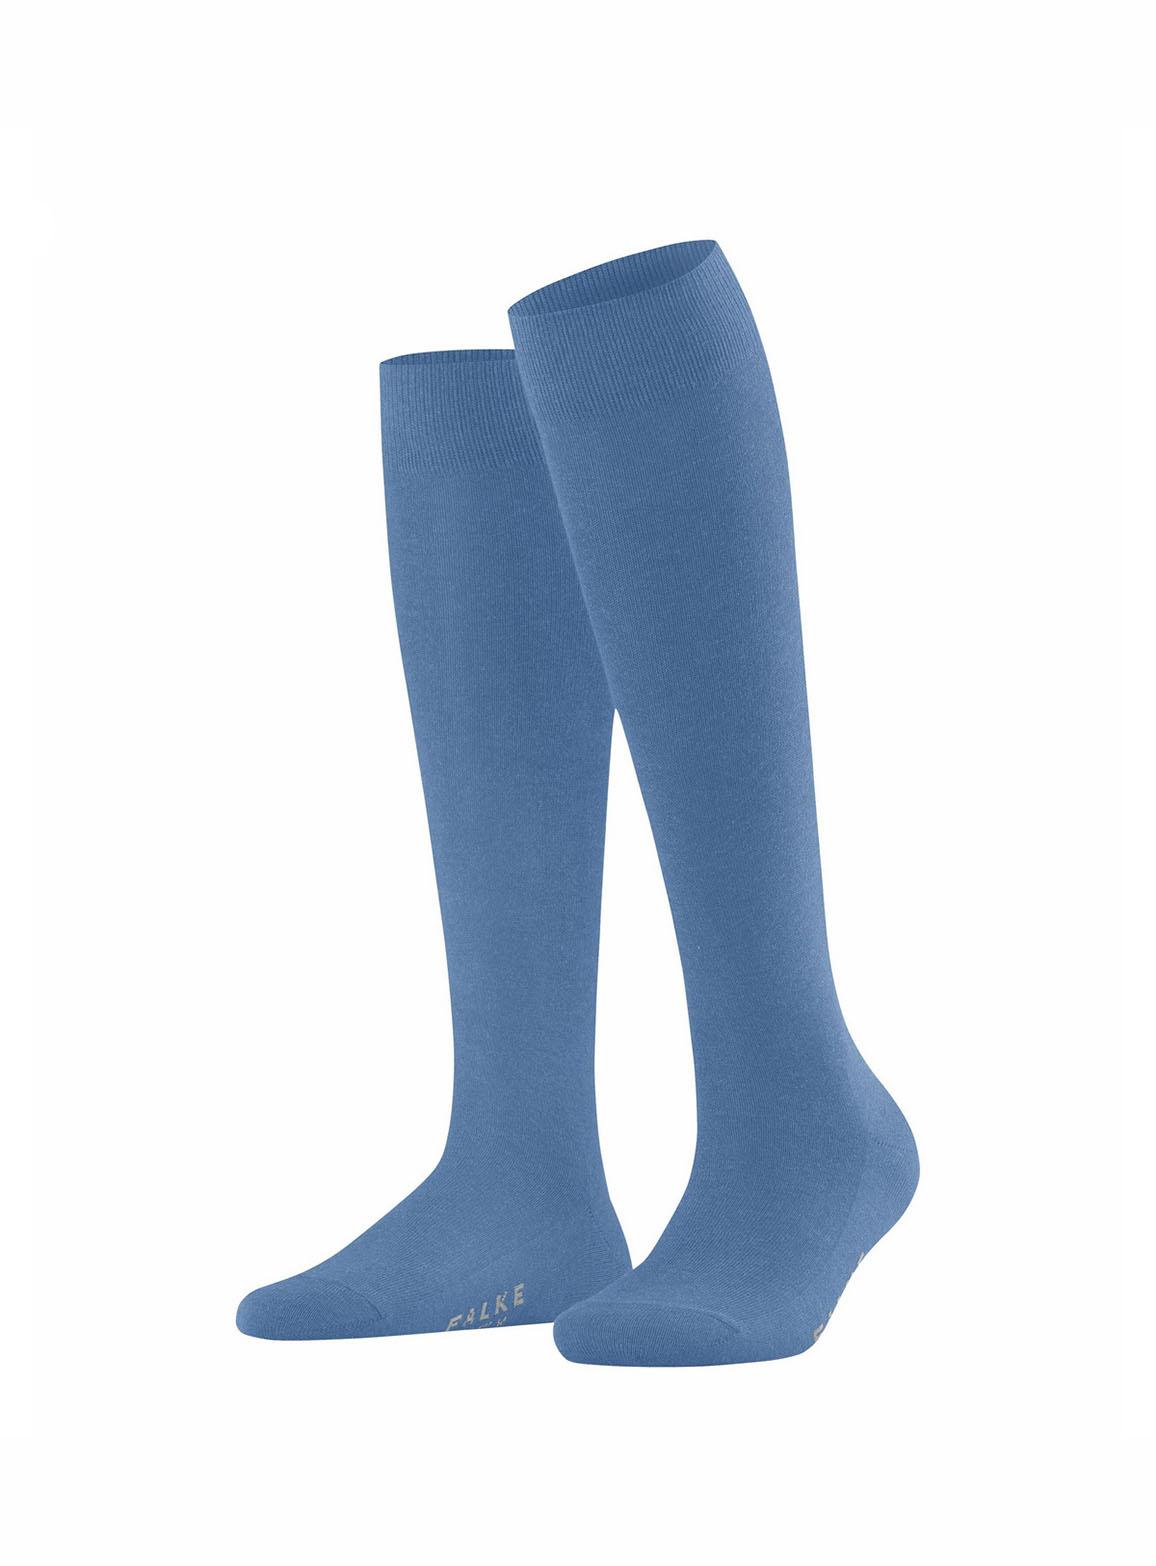 Dusty blue family women knee-high socks